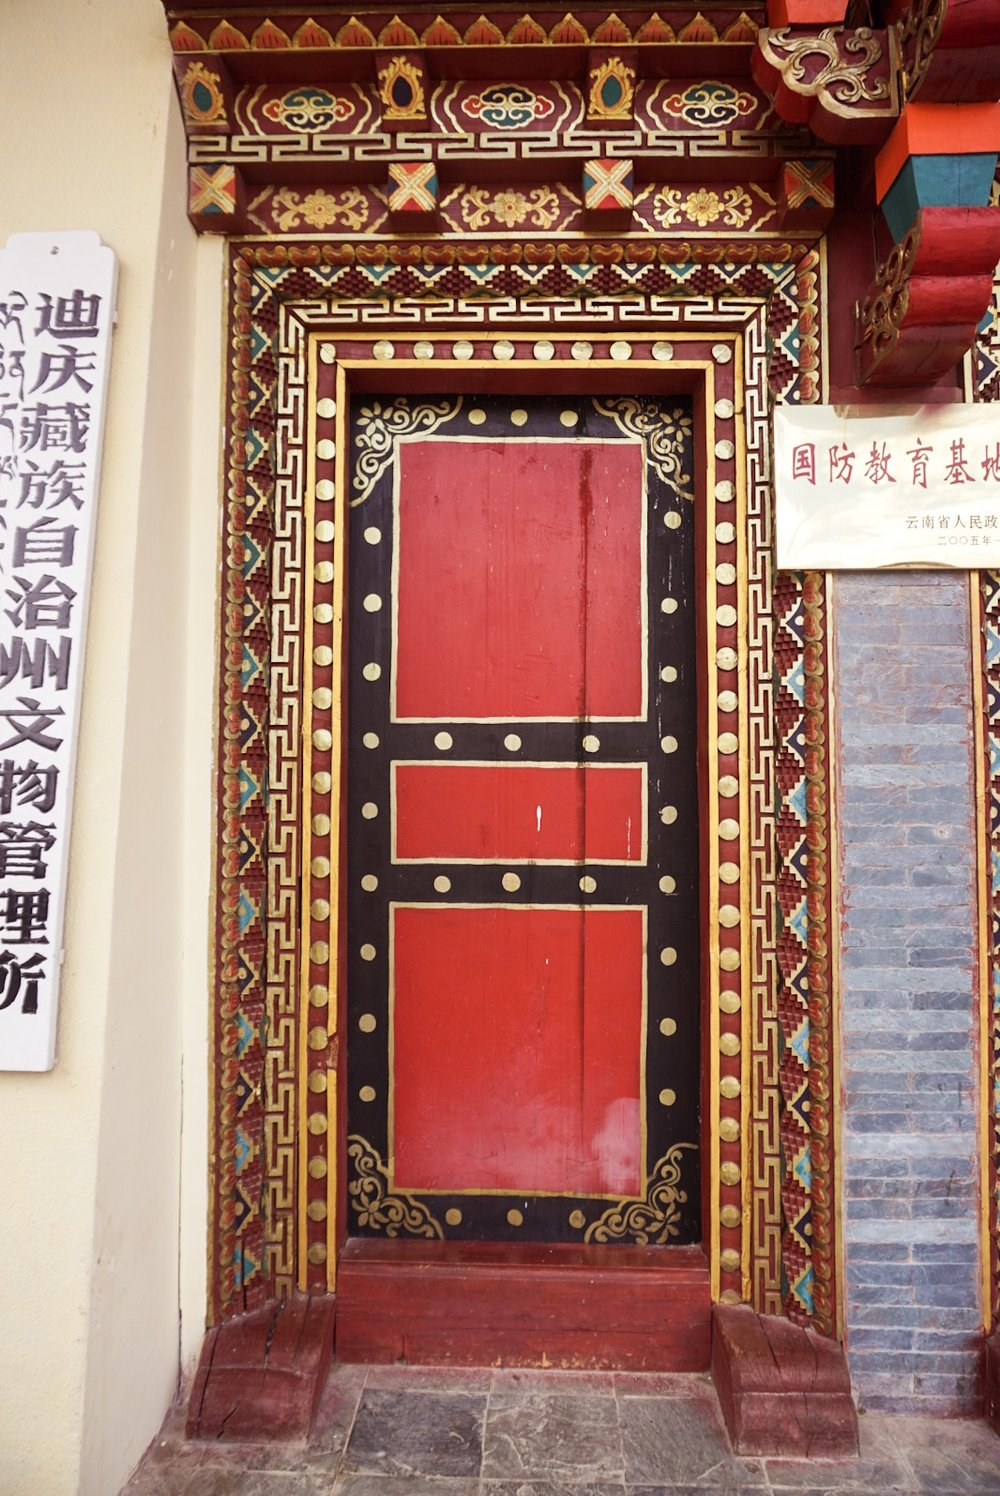 CocoGigiDesign -China-Shangri-La 201807179.JPG